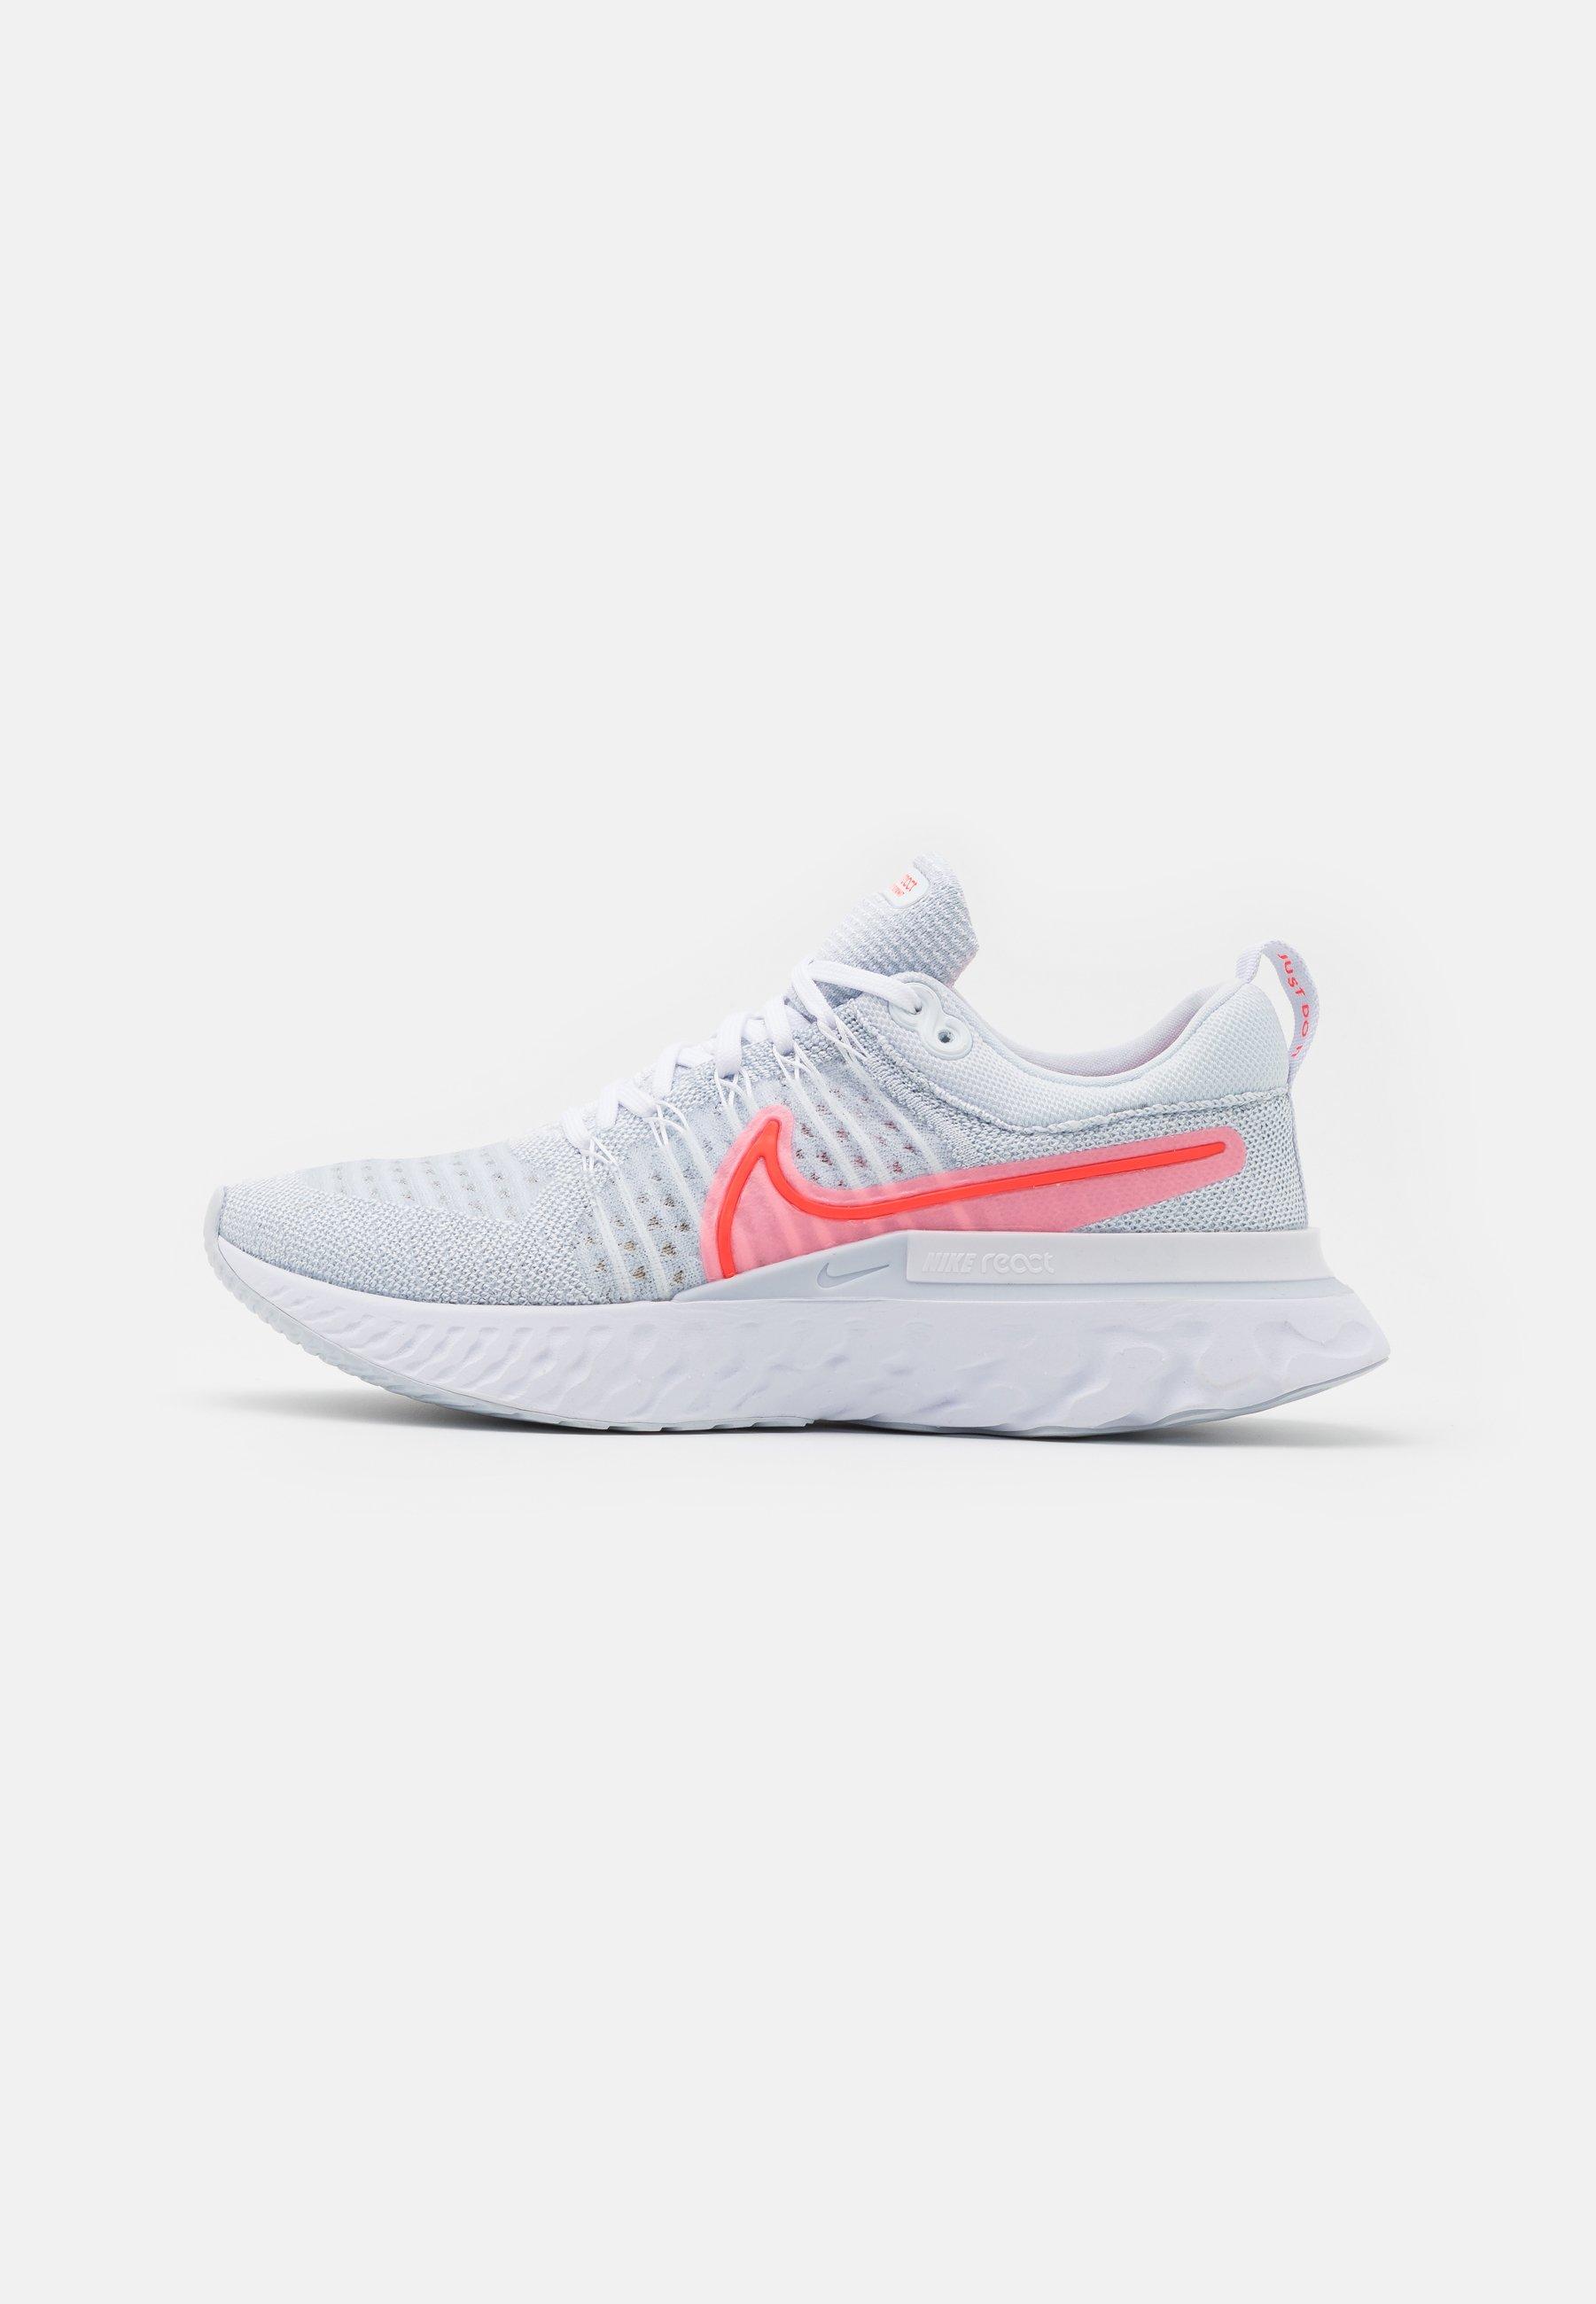 Women's Nike React Infinity Run Flyknit 2 'Platinum / Crimson' 0.49 Free Shipping